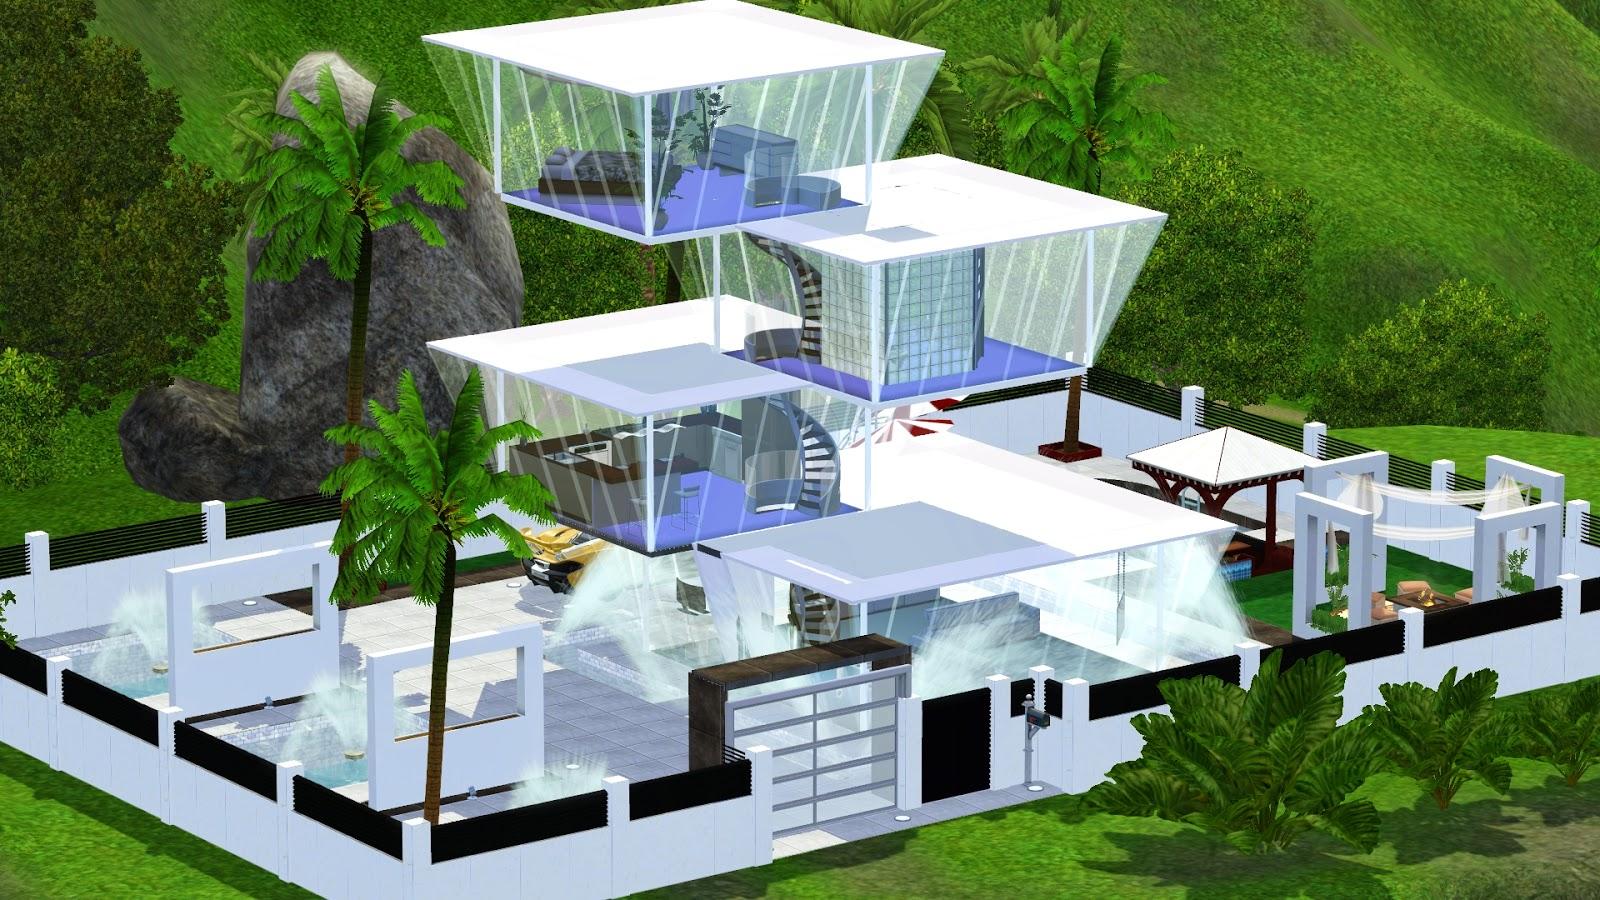 http://thomasjchee.blogspot.com.au/p/ts3-lot-kurasu.html